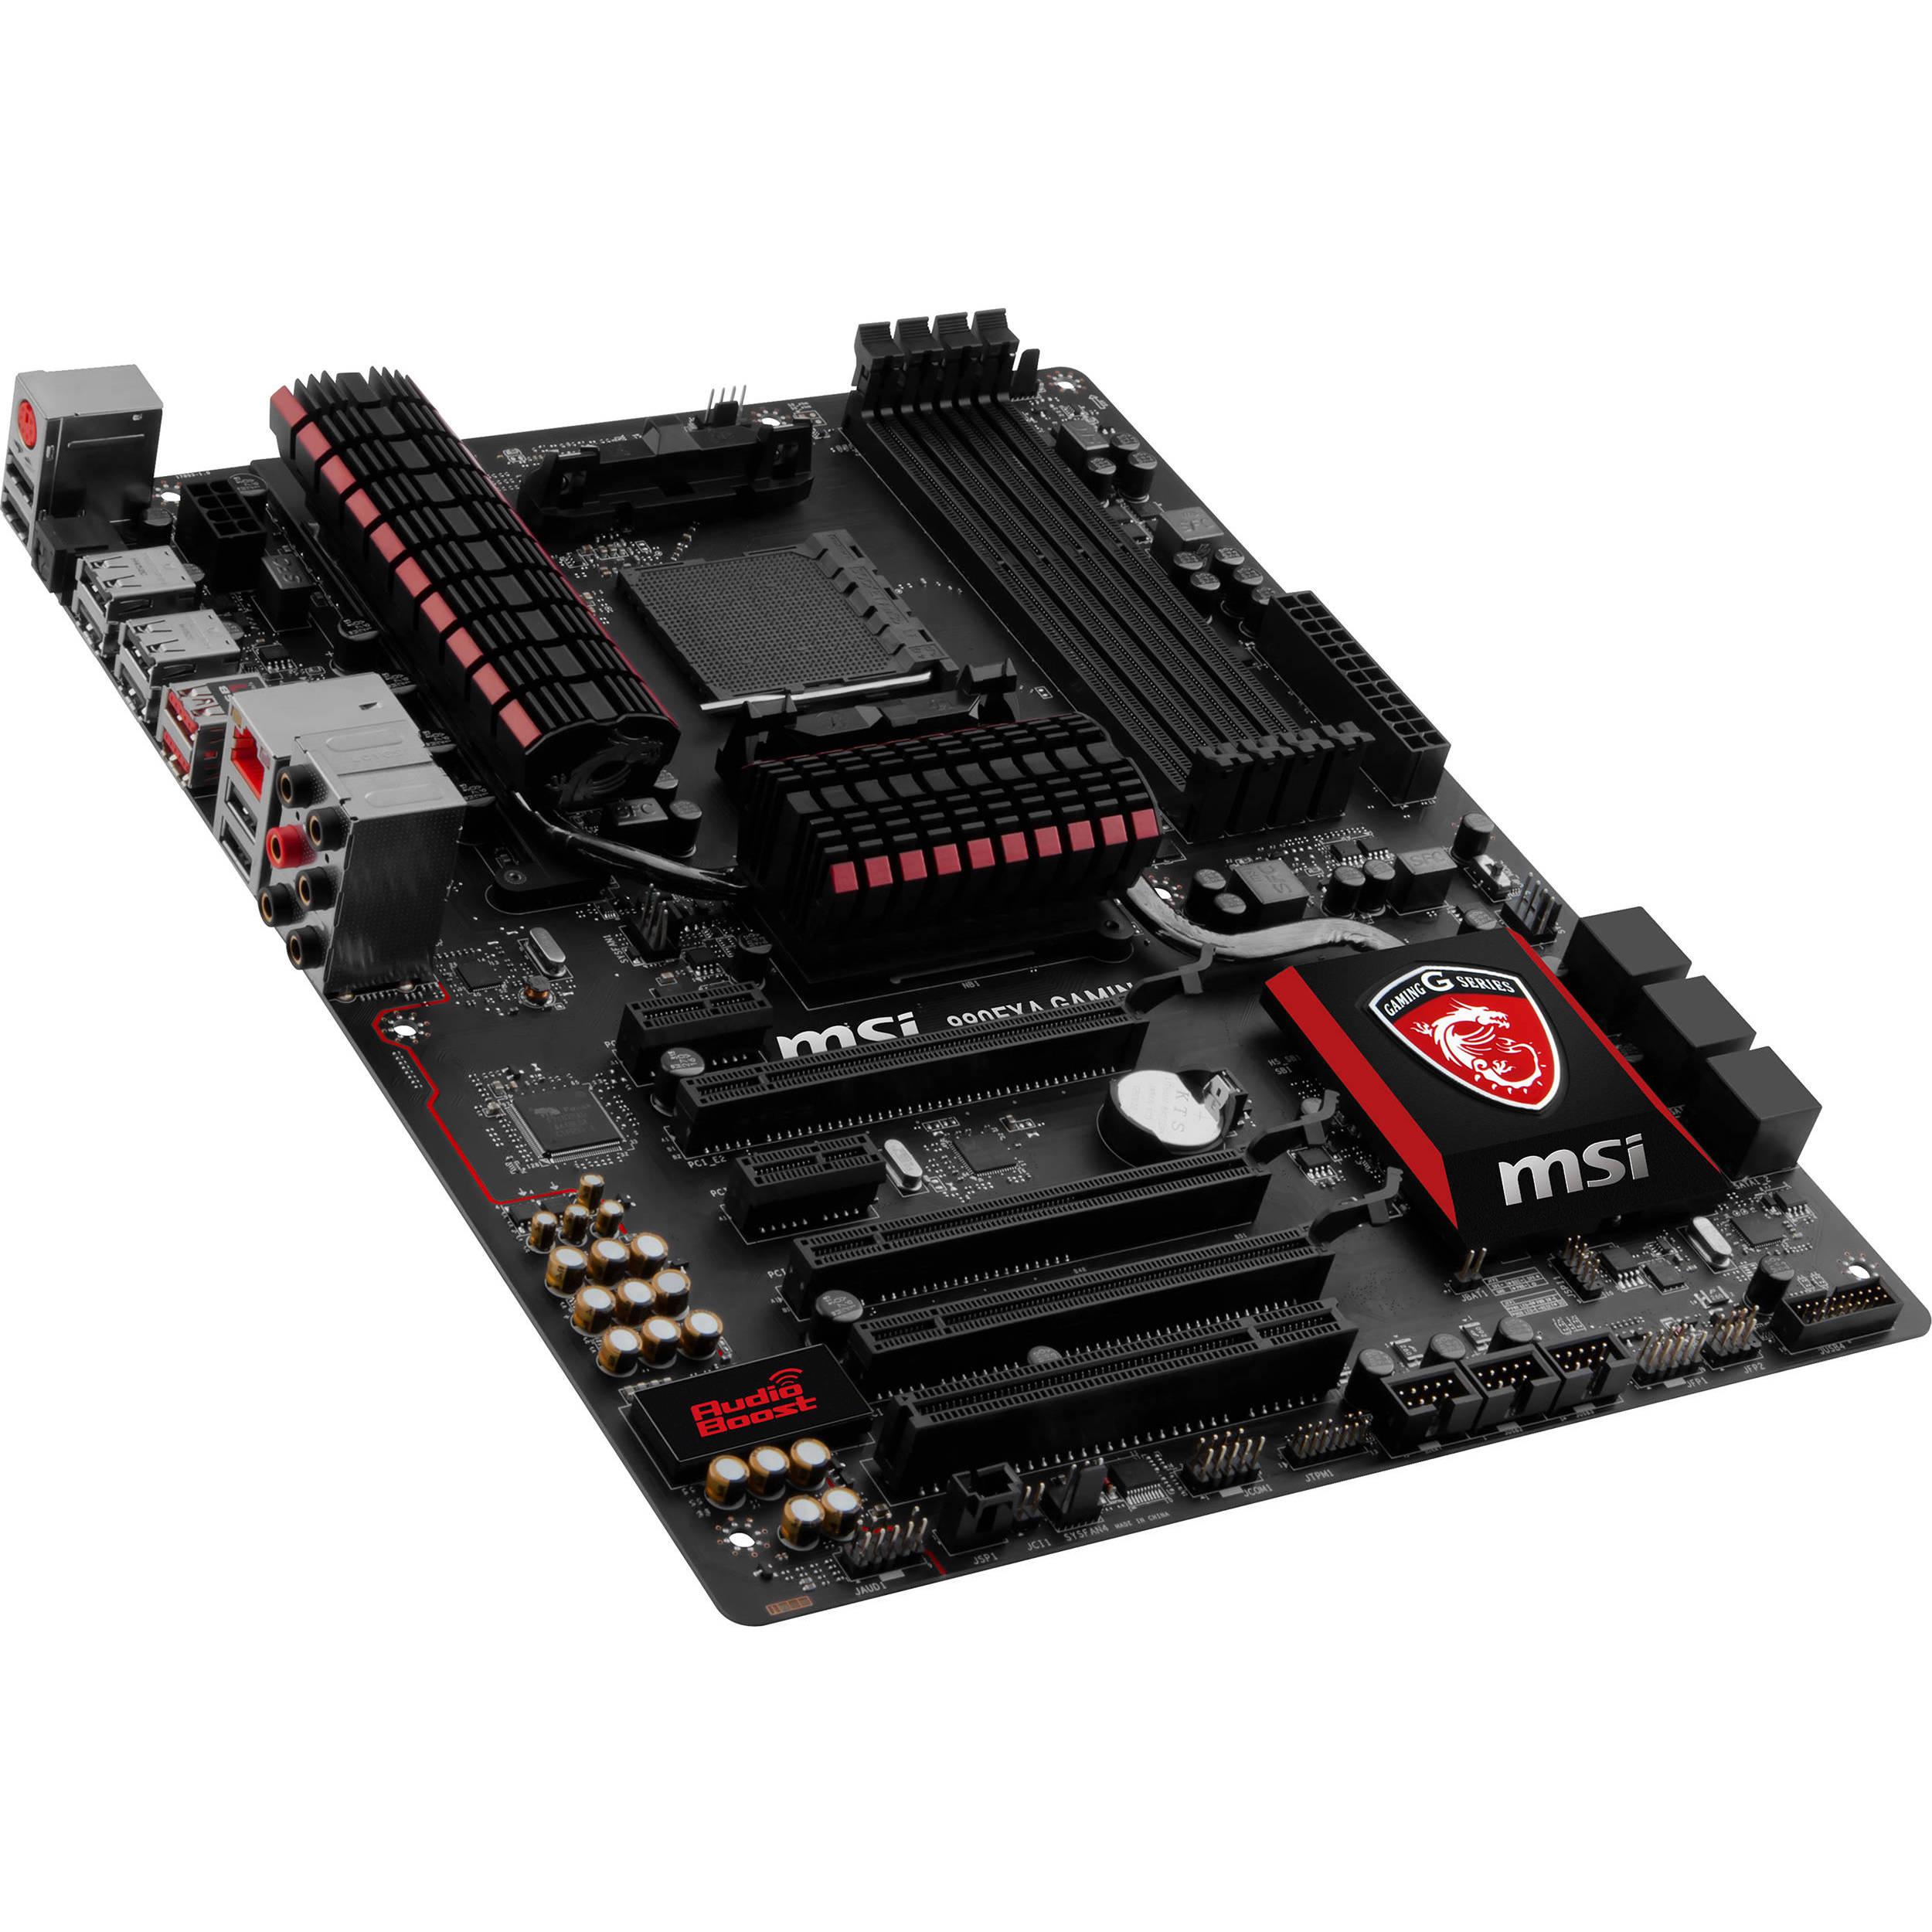 MSI 990FXA Gaming VIA USB 3.0 Driver Windows